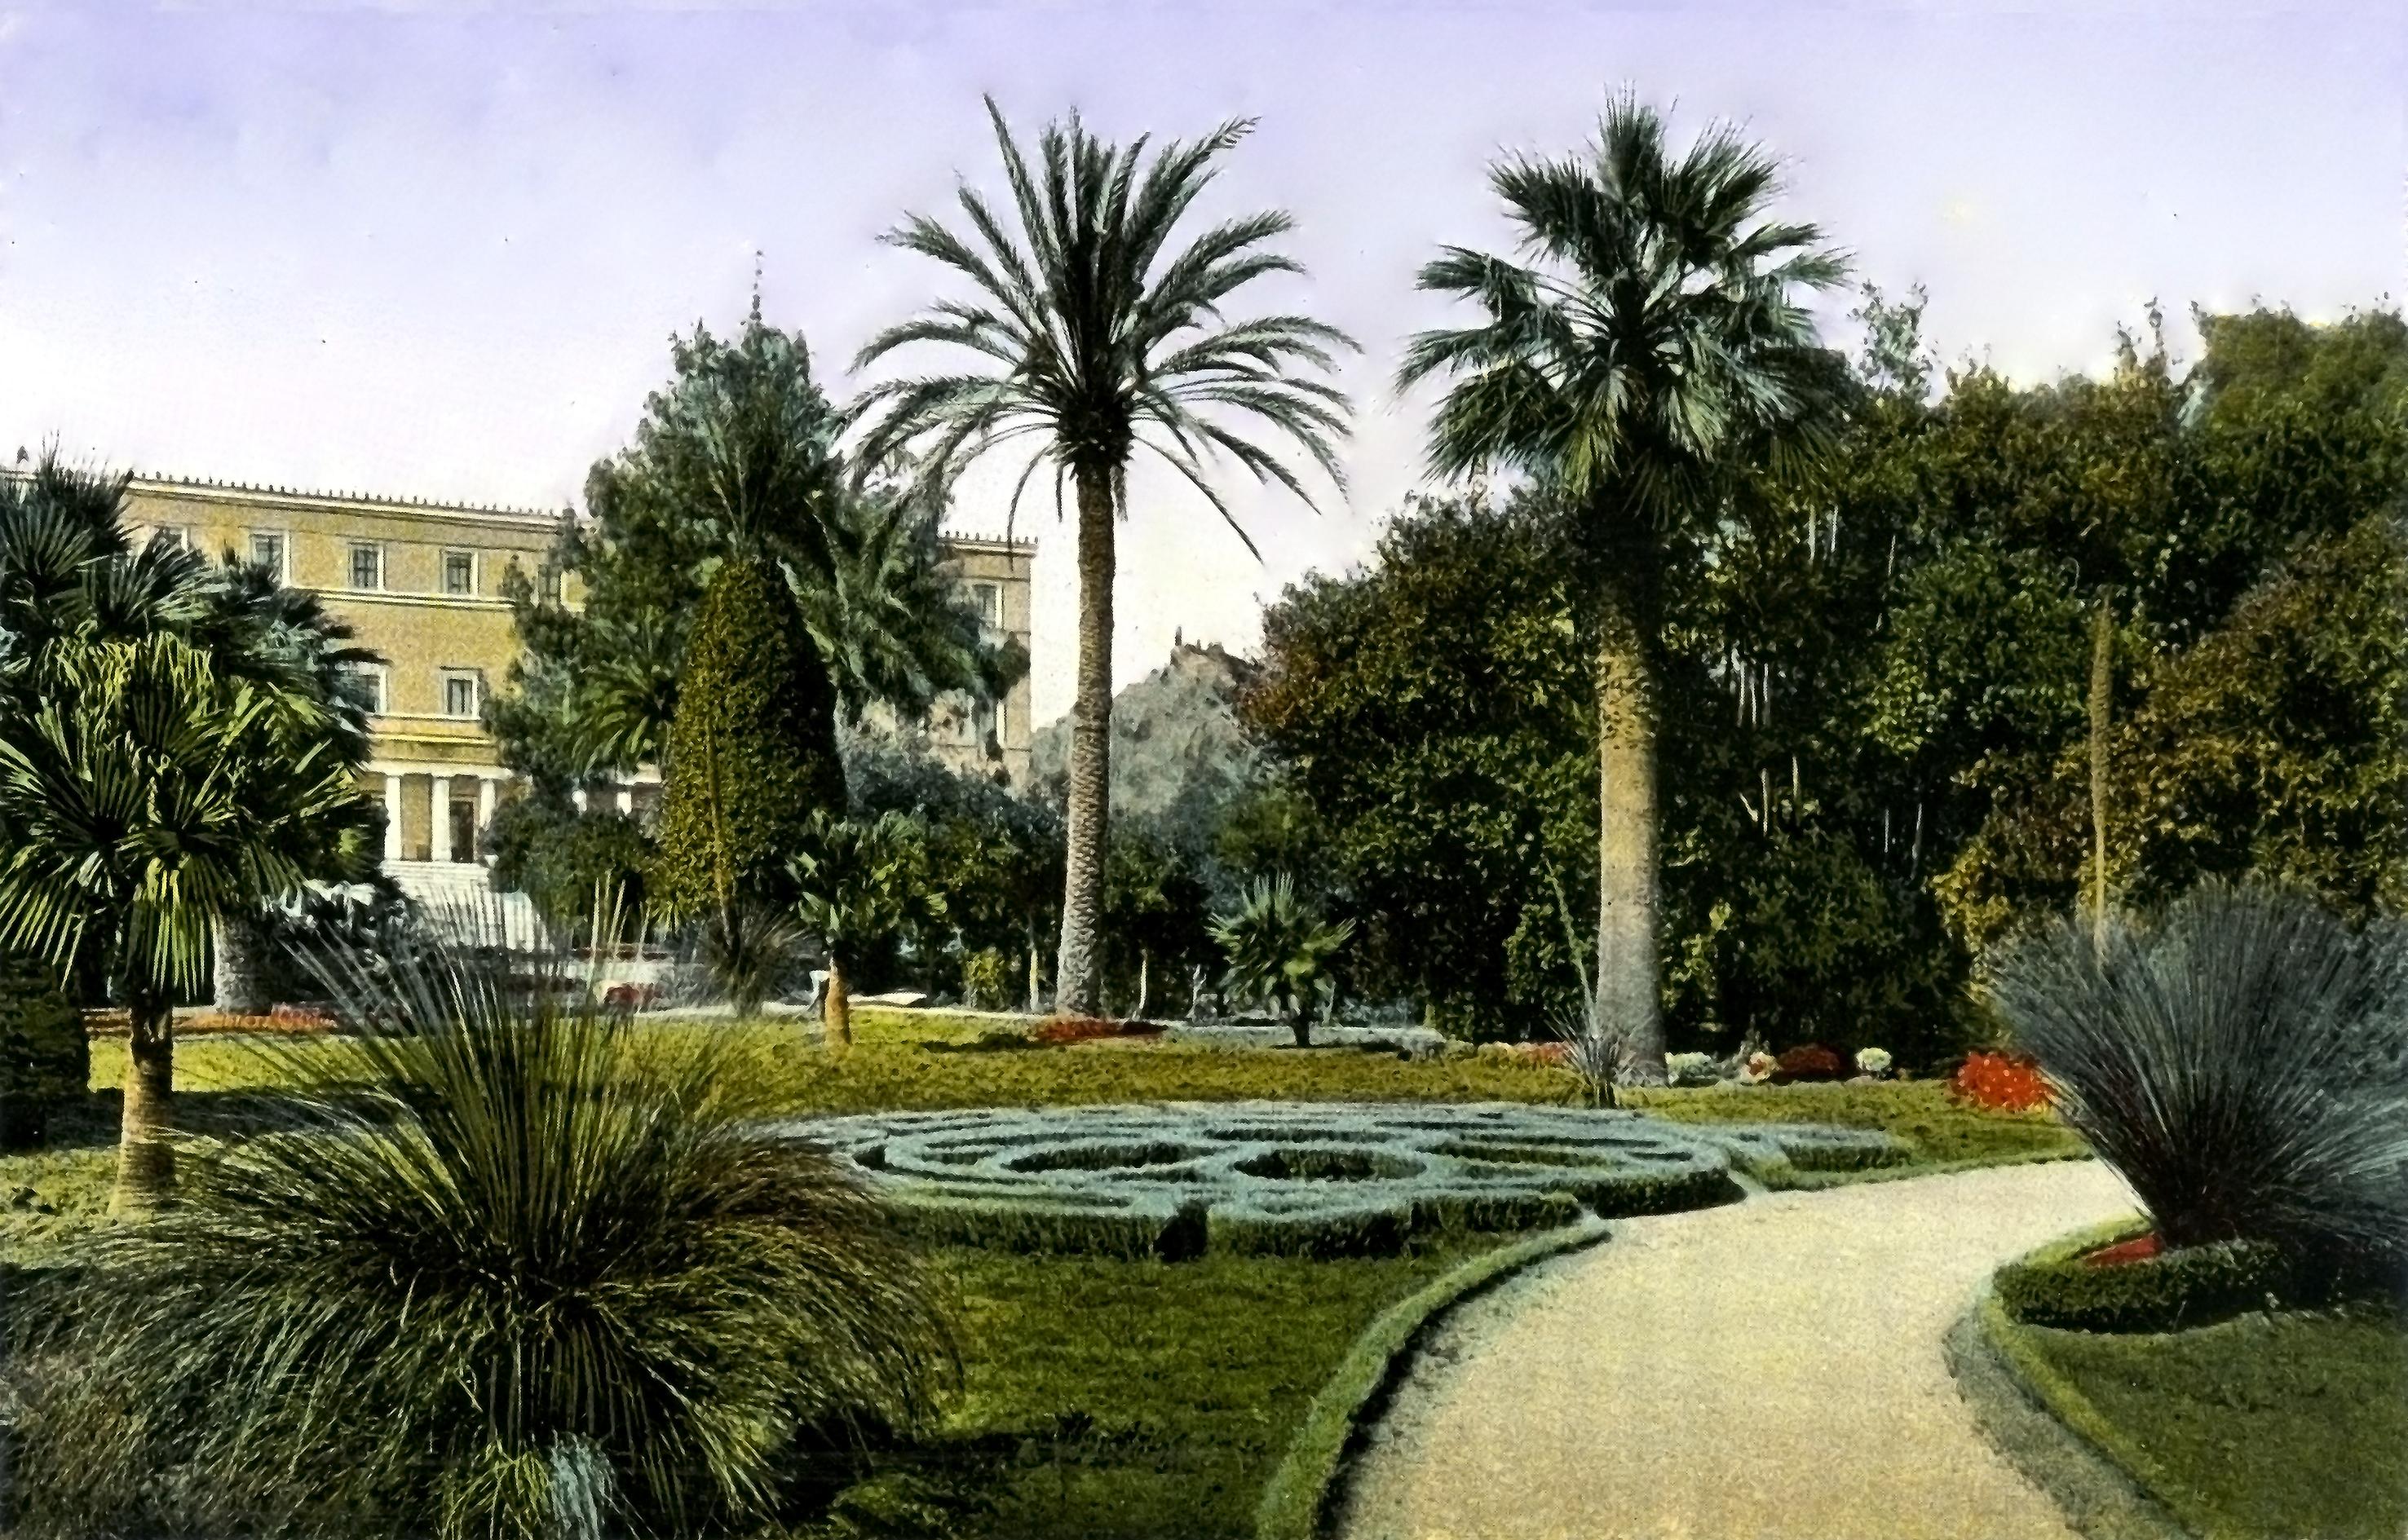 File:Royal Gardens 1905.png - Wikipedia